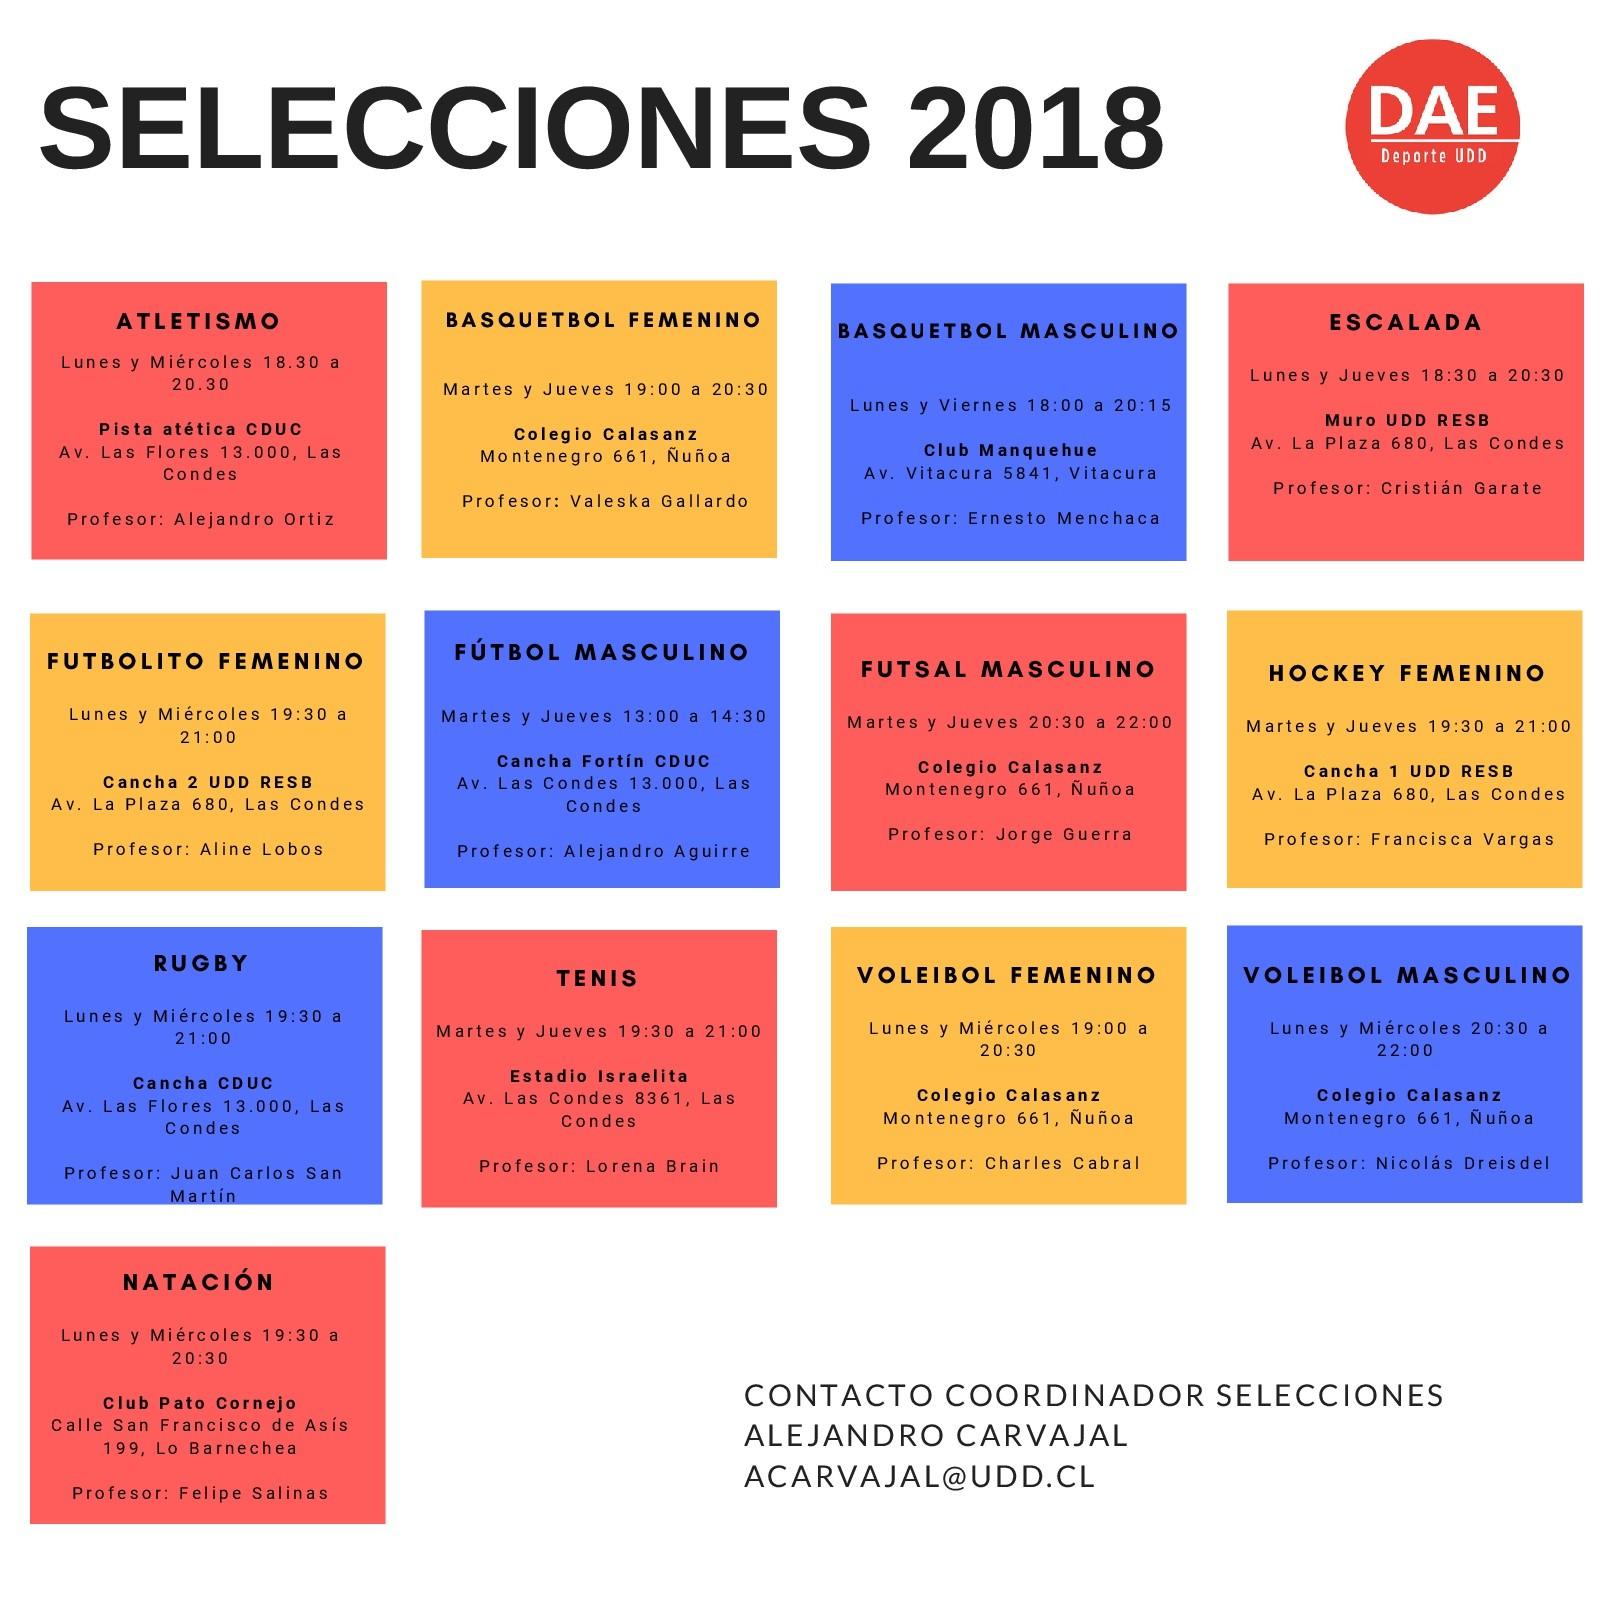 SELECCIONES 2018